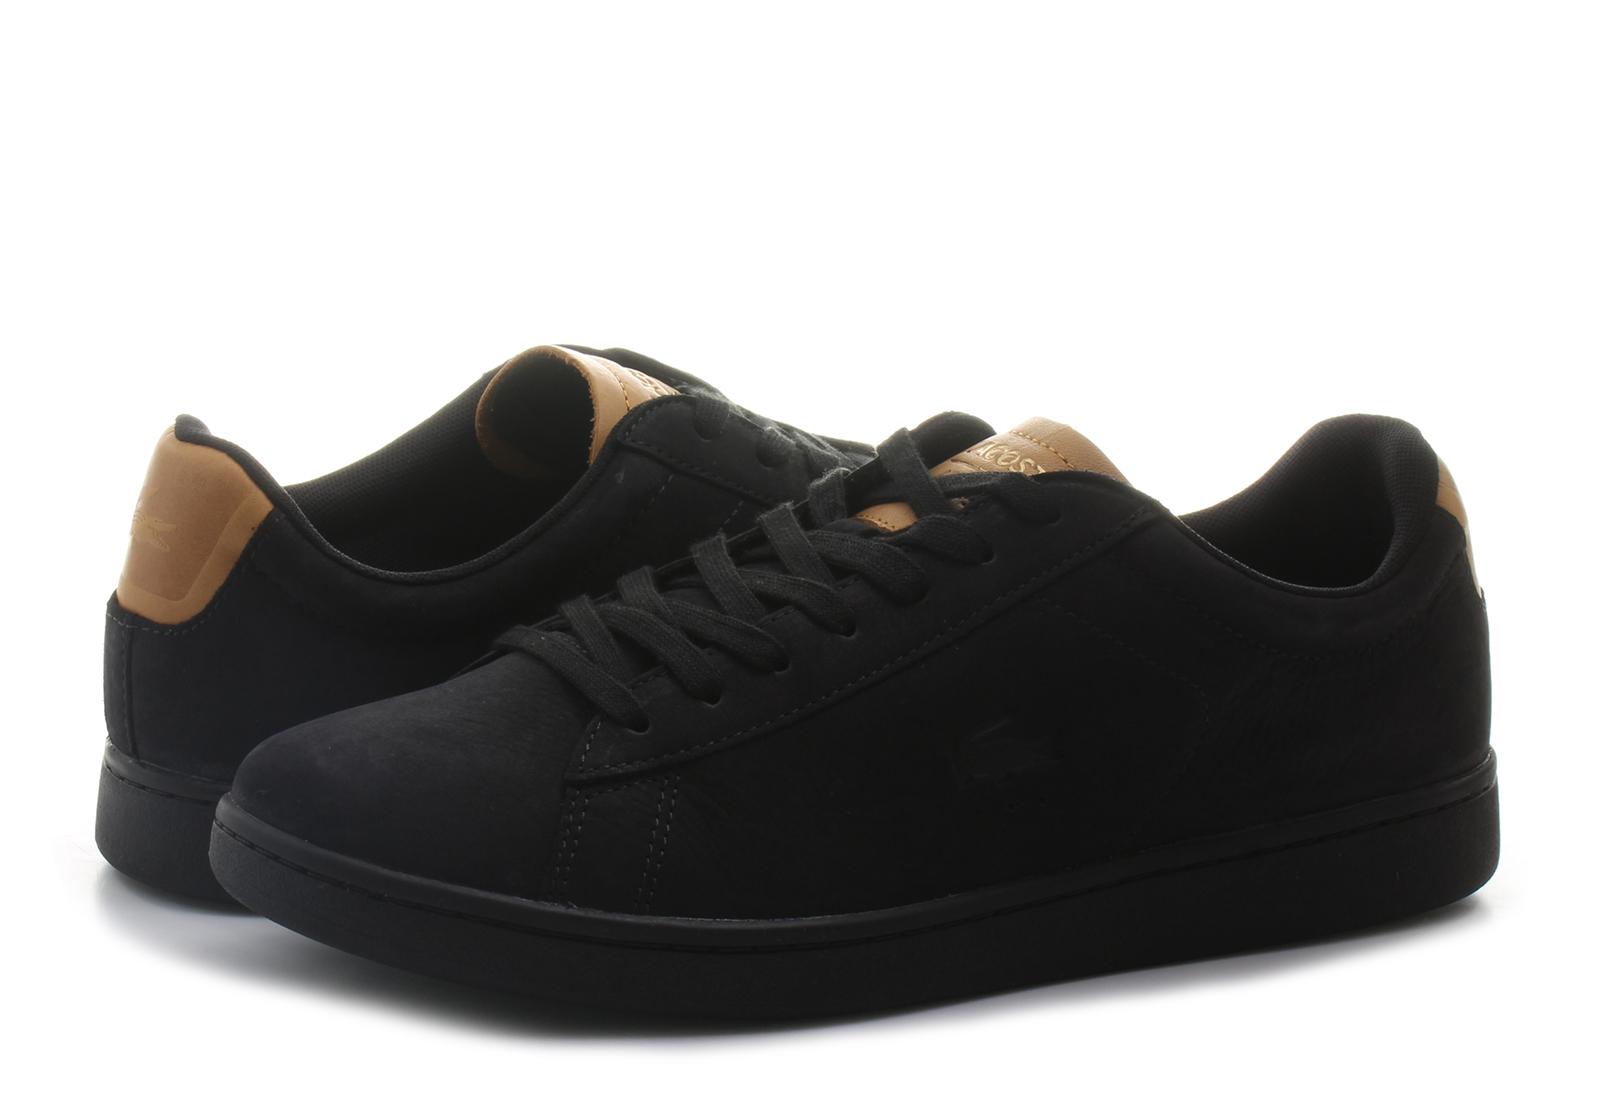 Lacoste Cipő - Carnaby Evo - 173SPM0060-024 - Office Shoes ... 9afa2b793e